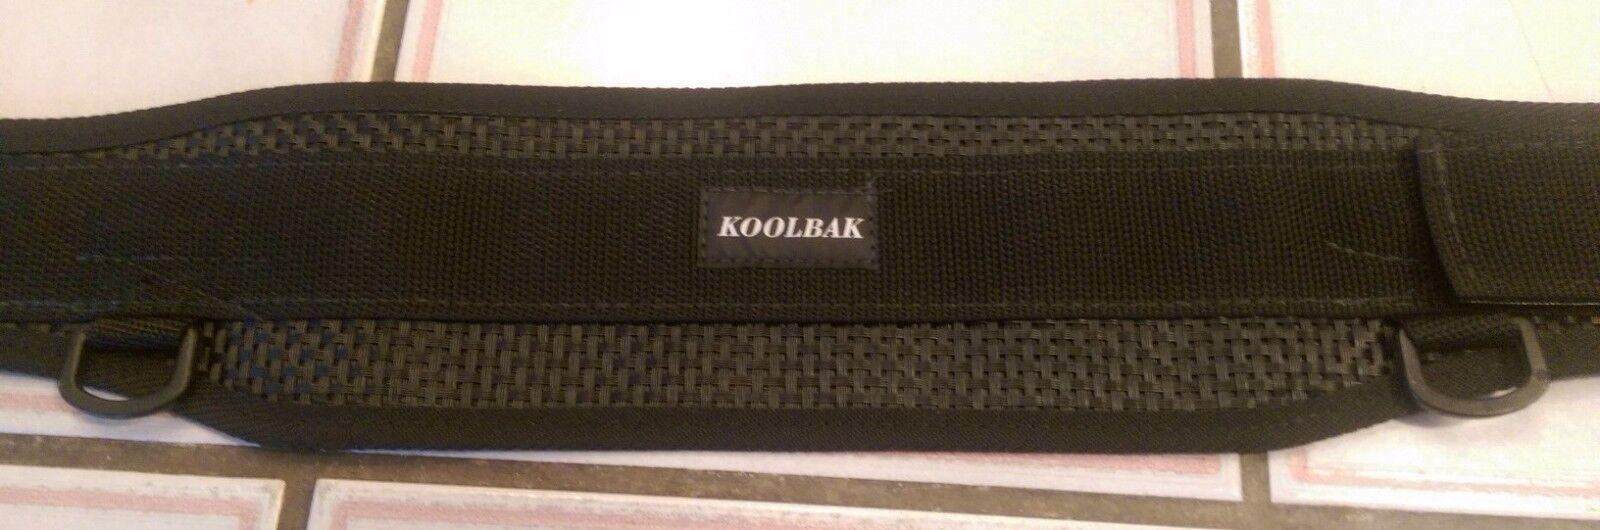 KoolBak Wader Belt for flyfishing fly fishing FREE SH